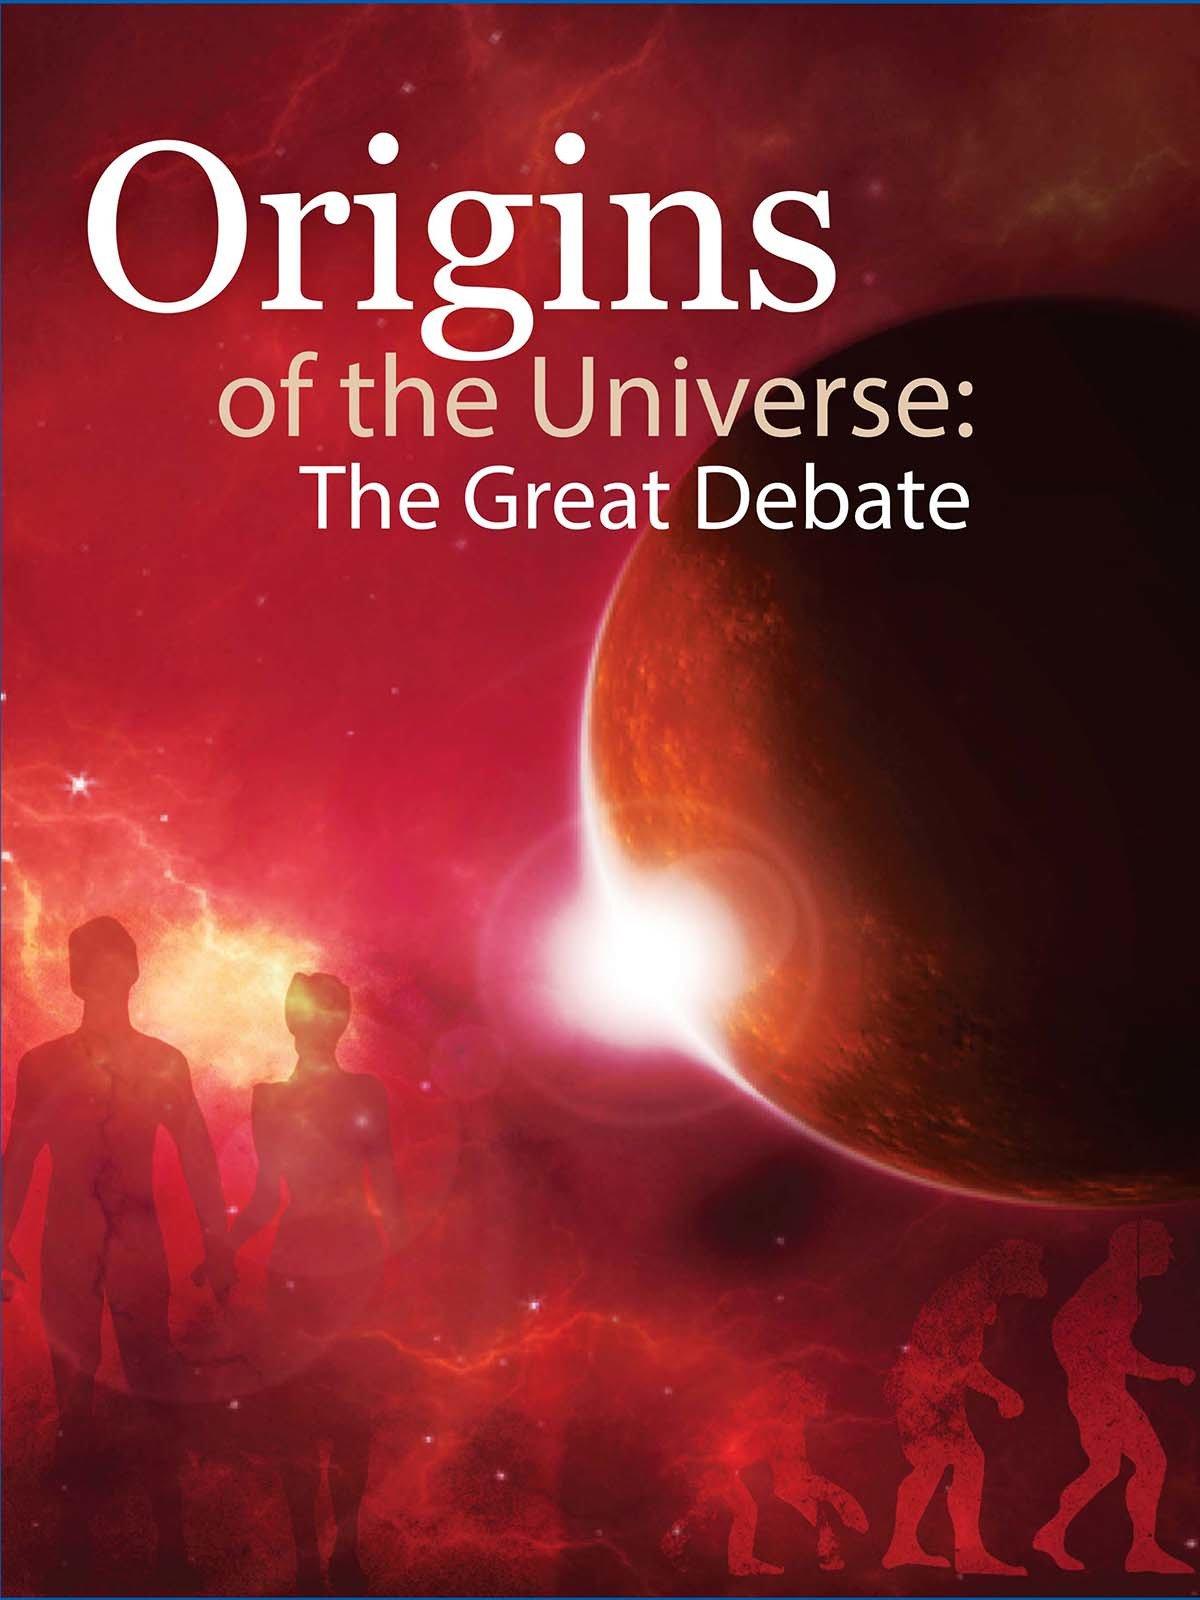 Origins of the Universe: The Great Debate on Amazon Prime Video UK